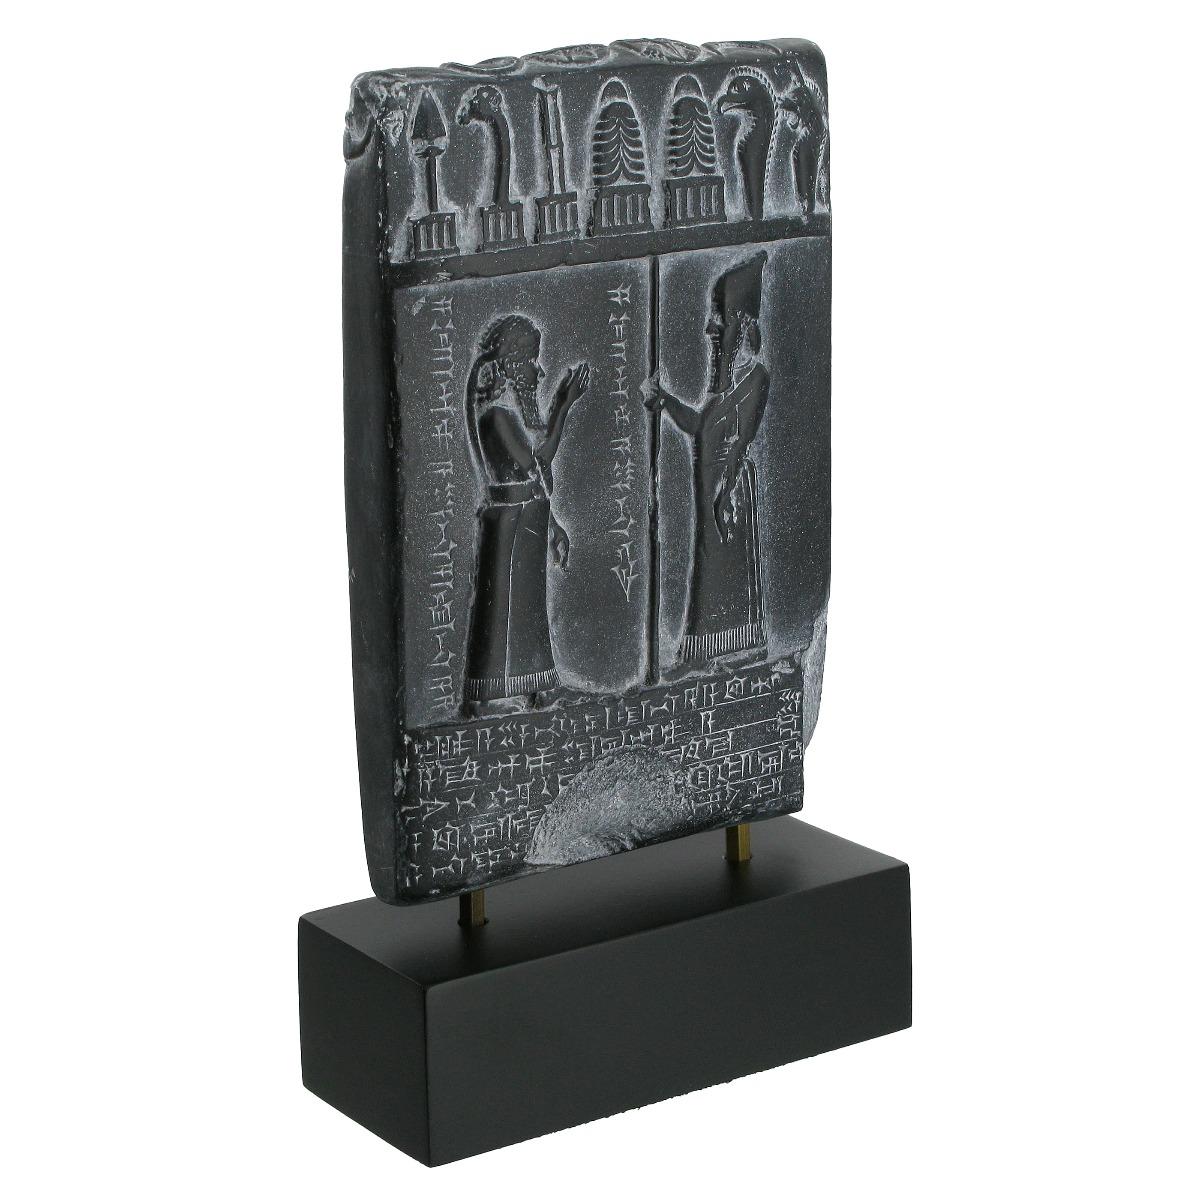 Replica of Babylonian Tablet